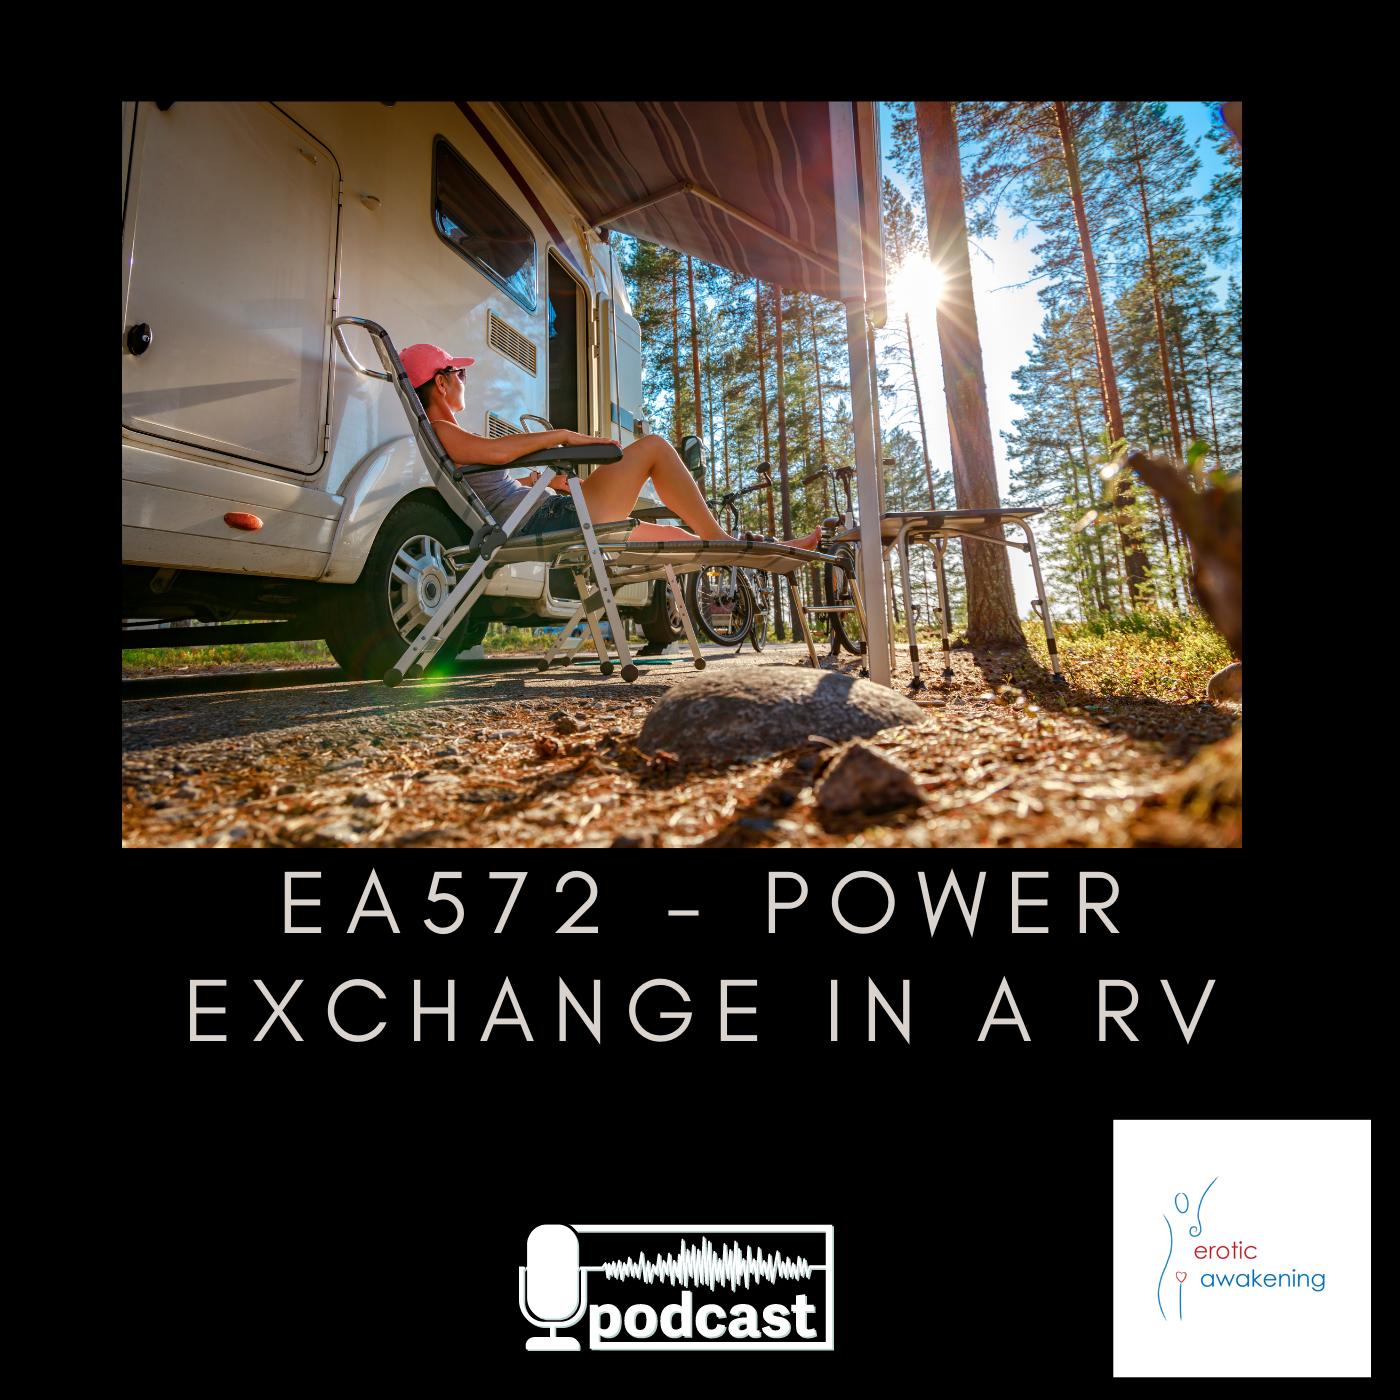 Erotic Awakening Podcast - EA572 - Power Exchange In a RV